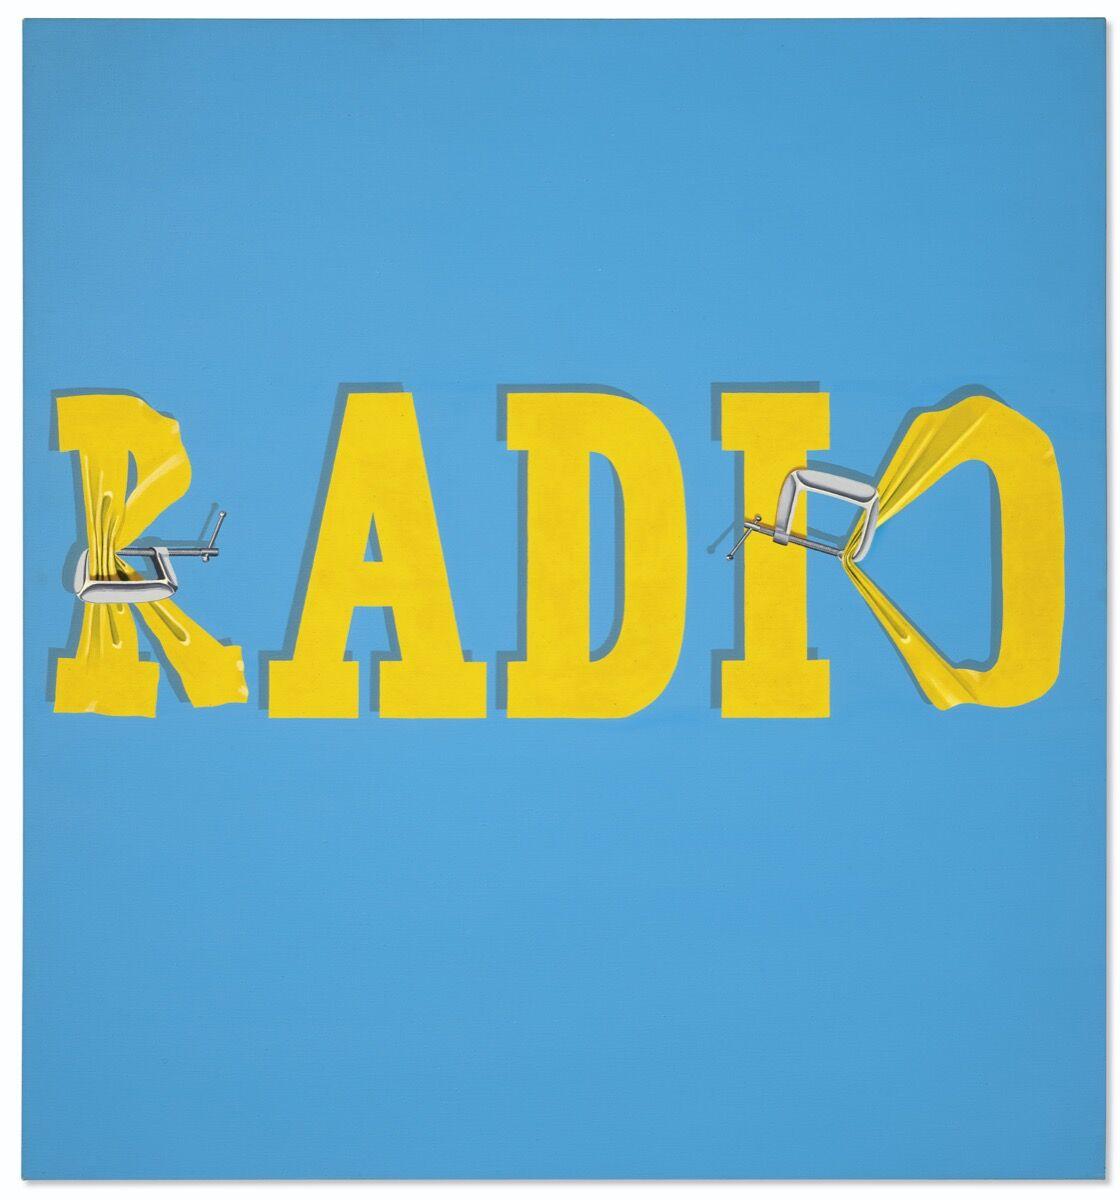 Ed Ruscha, Hurting the Word Radio # 2, 1964. Cortesía de Christie & # x27; s.